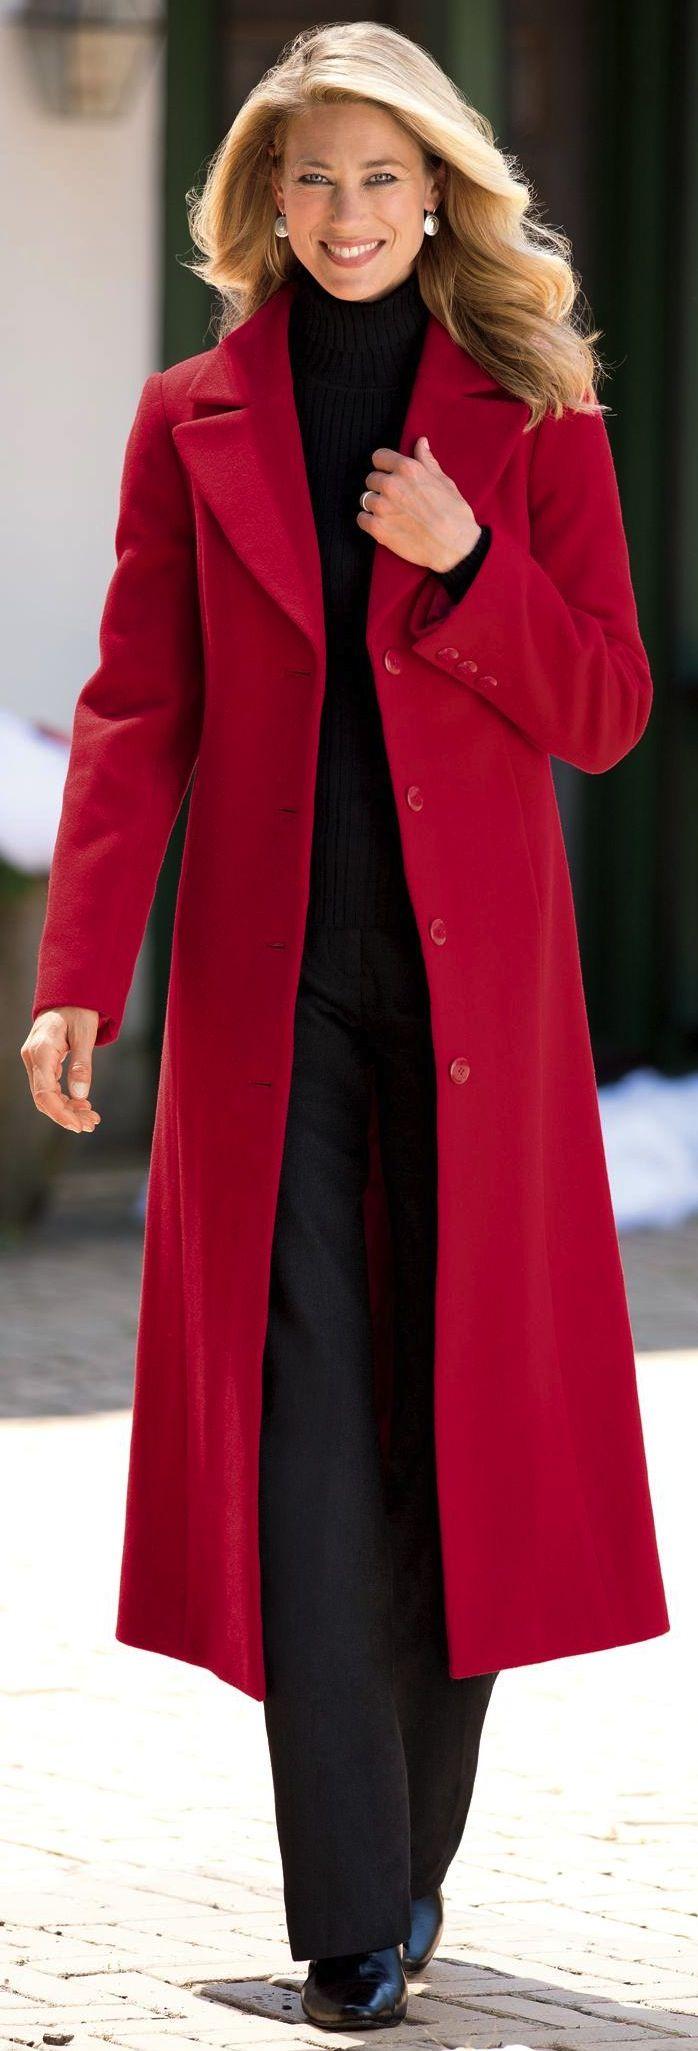 long coats moncler@#$99 on gdtkcce